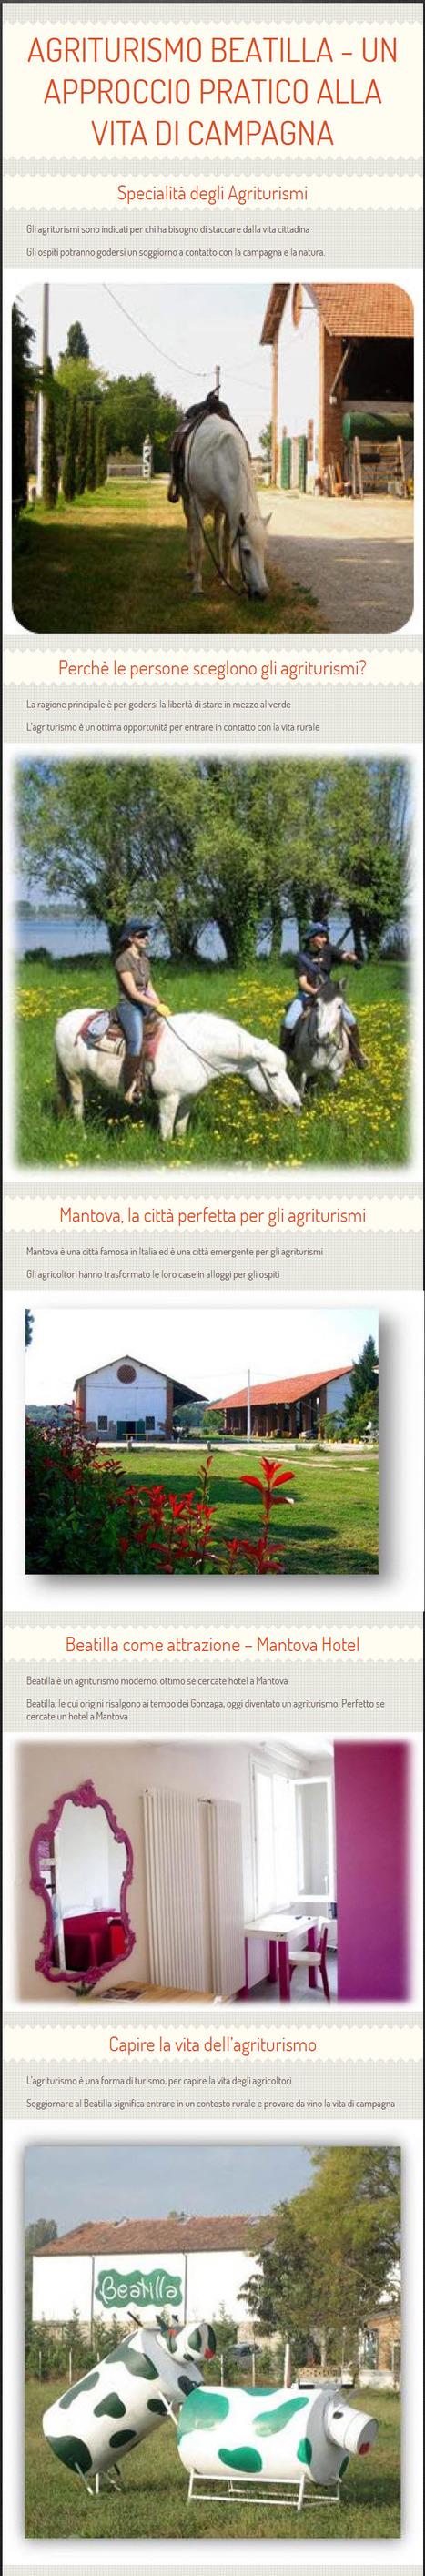 AgriturismoBeatilla - Unapprocciopraticoalla vita di campagna -www.agriturismobeatilla.it | Agriturismo beatilla | Scoop.it